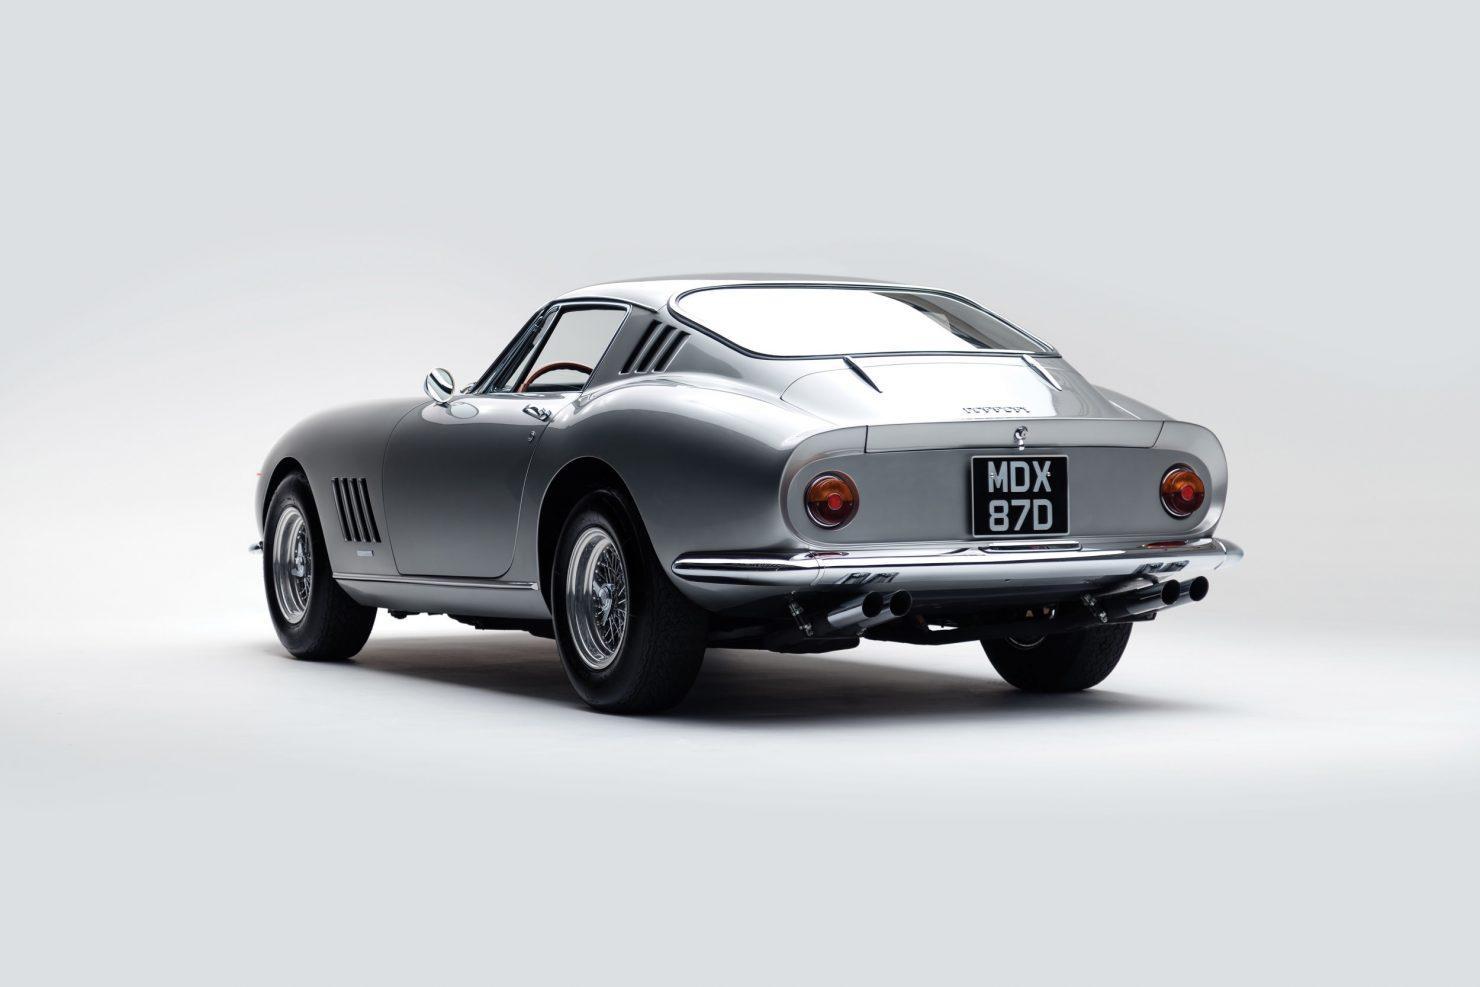 ferrari 275 gtb car 19 1480x987 - 1965 Ferrari 275 GTB/6C Alloy